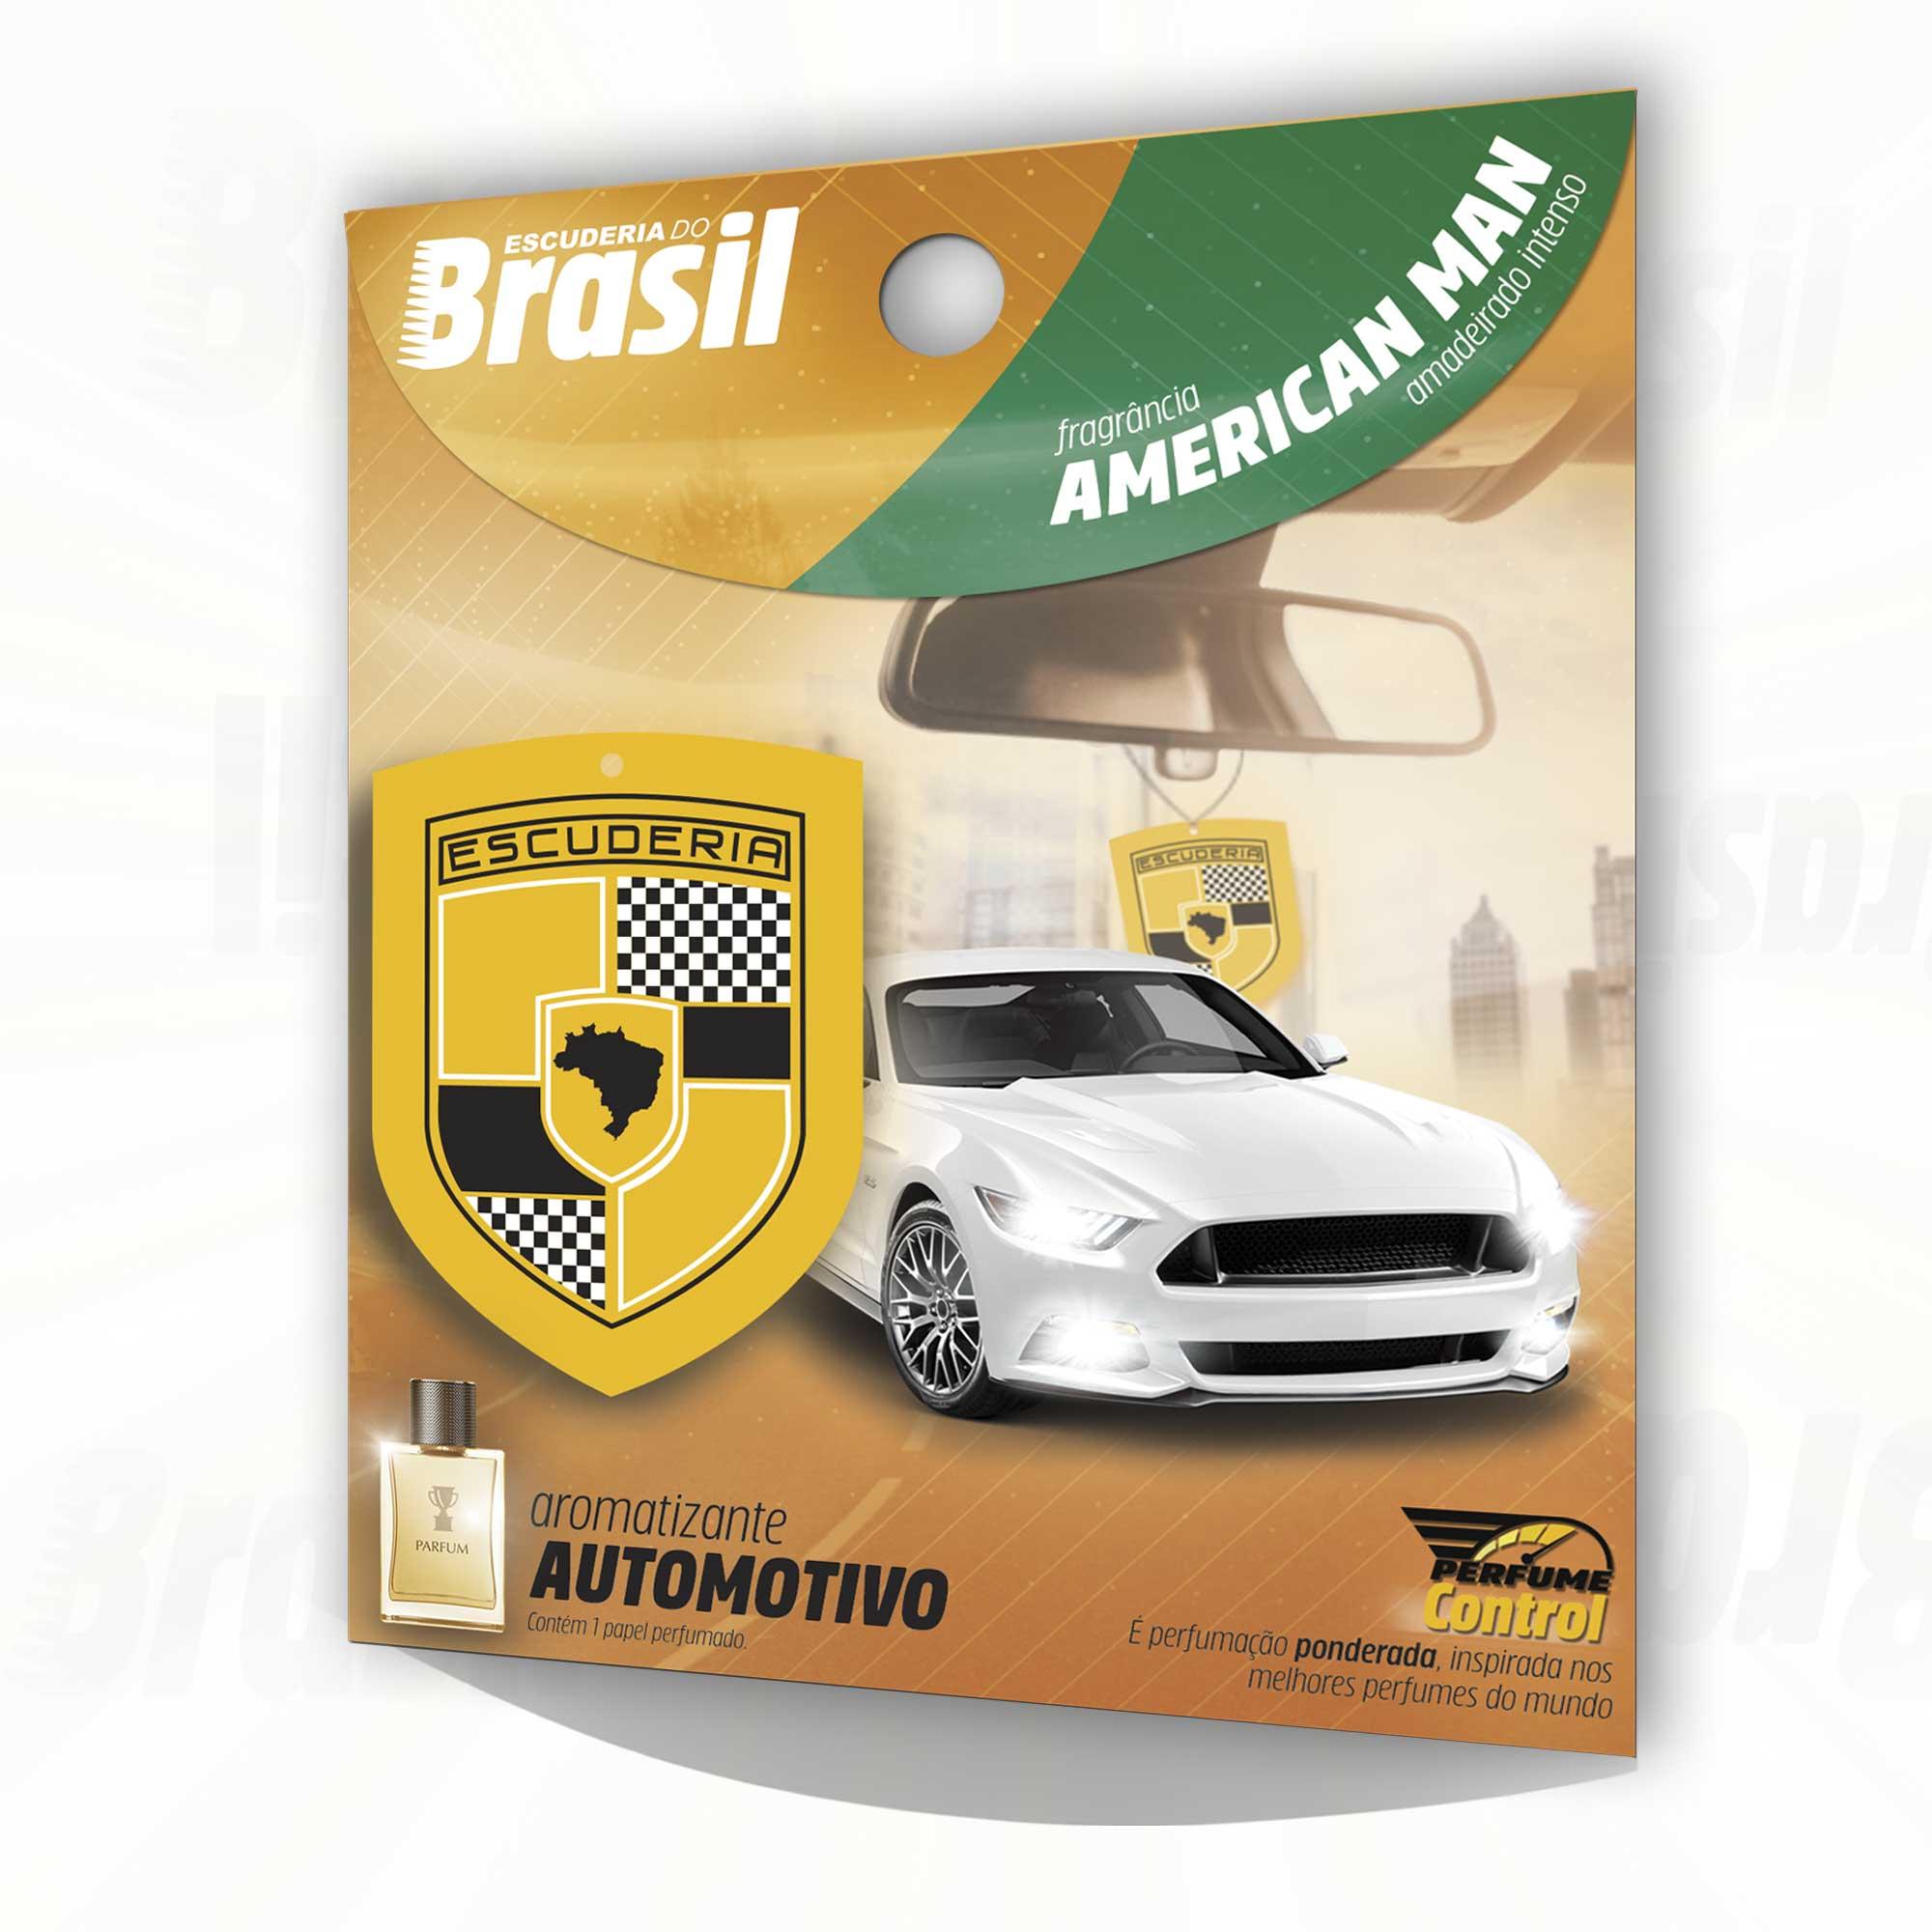 American Man - Perfume Control  - Escuderia do Brasil